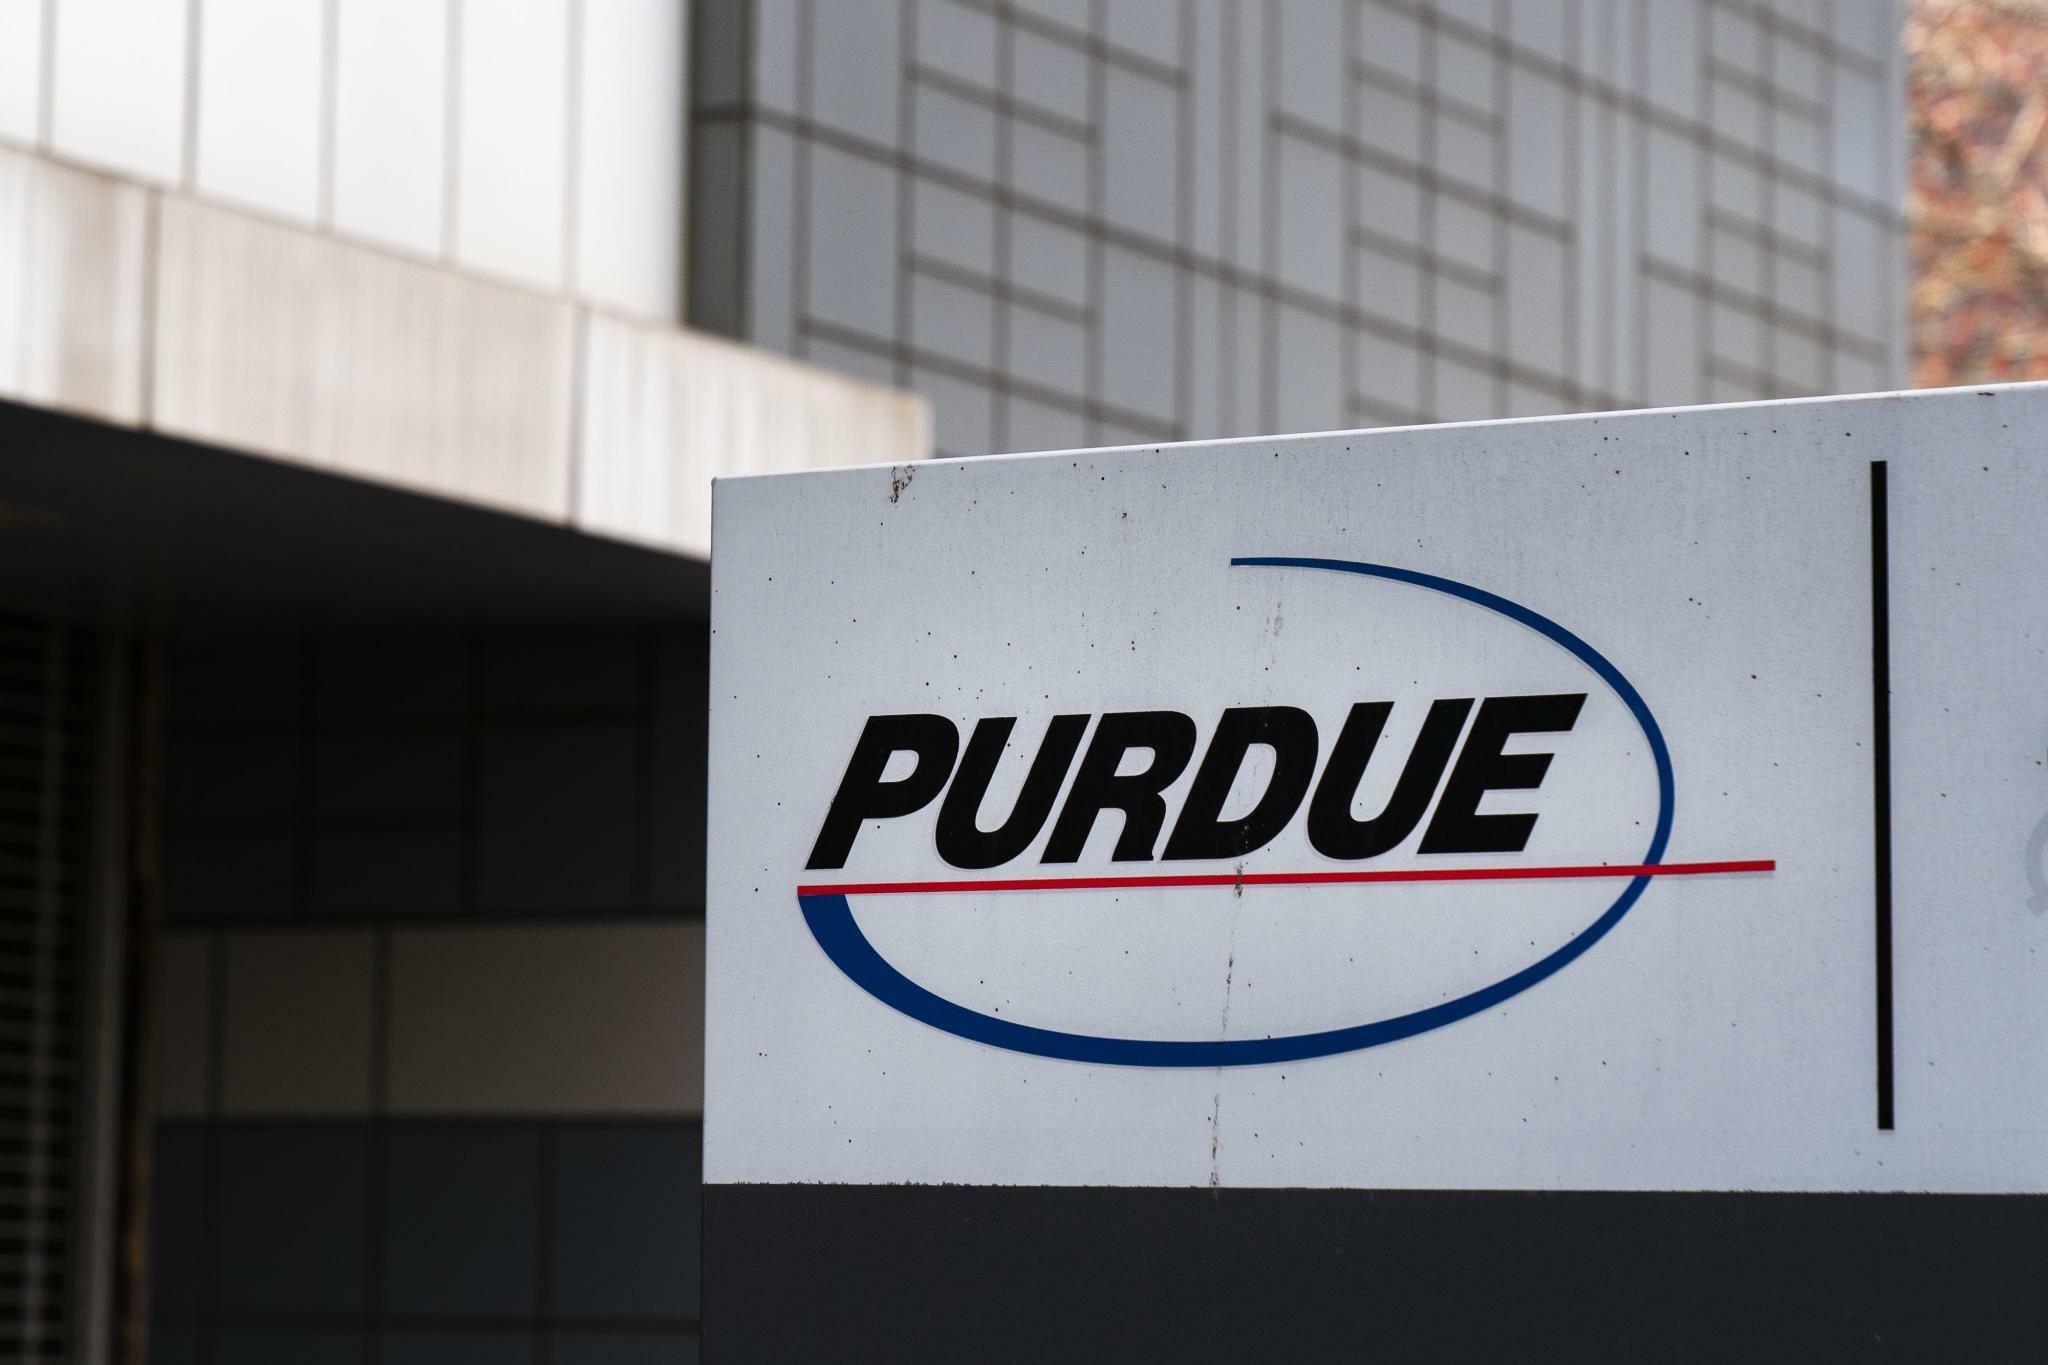 Purdue beantragt Insolvenz wegen Opiod-Klagen